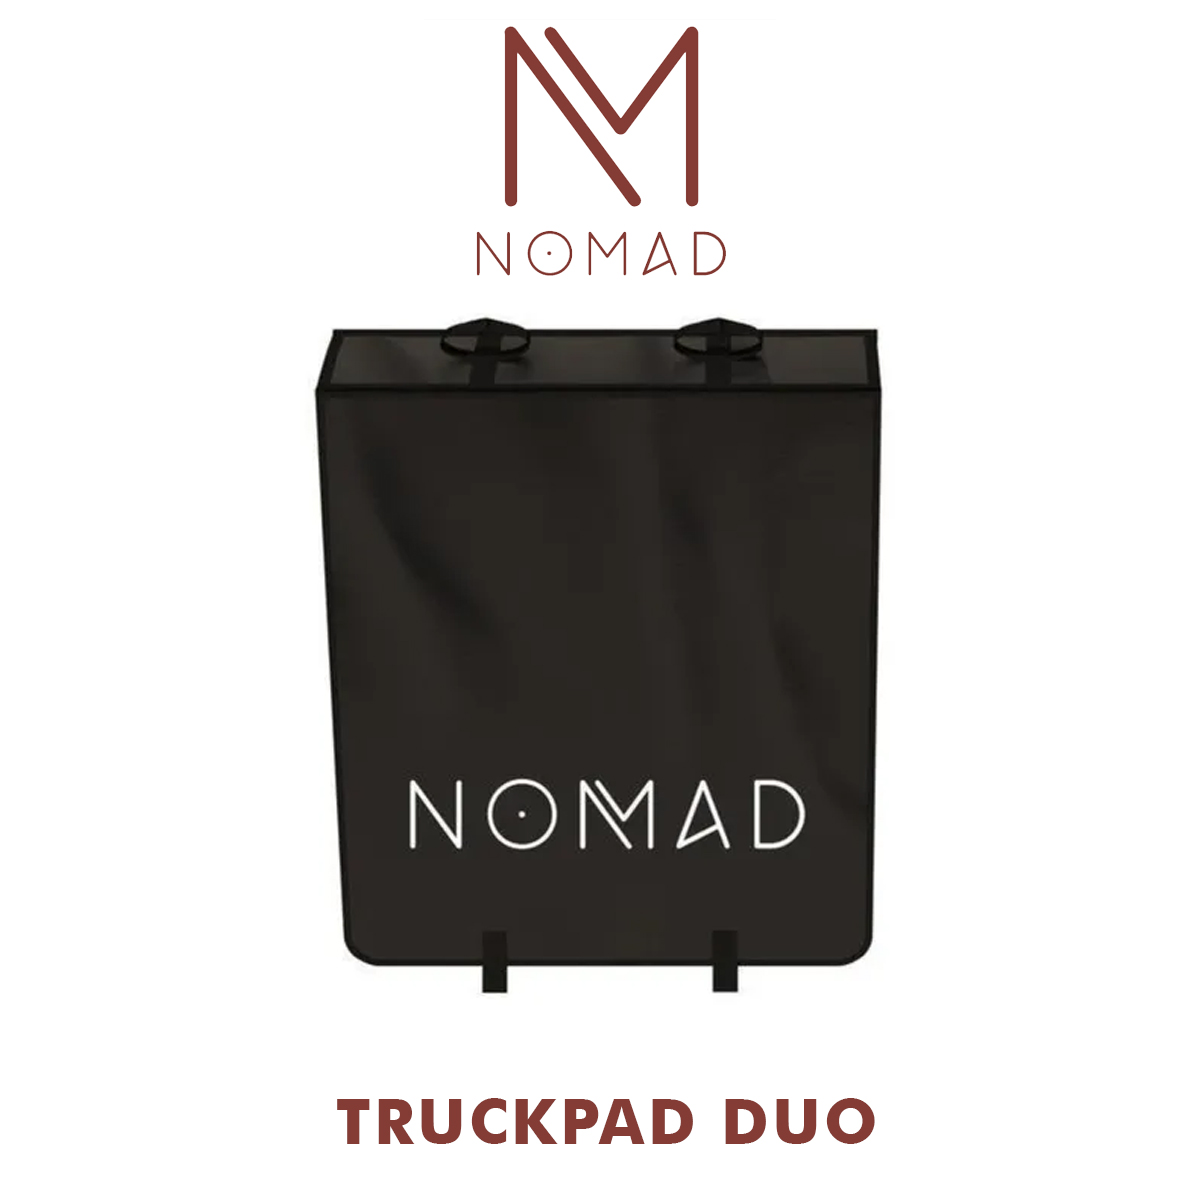 Truckpad Duo Pad Nomad Suporte para Bicicleta em Caminhonetes Poliparts